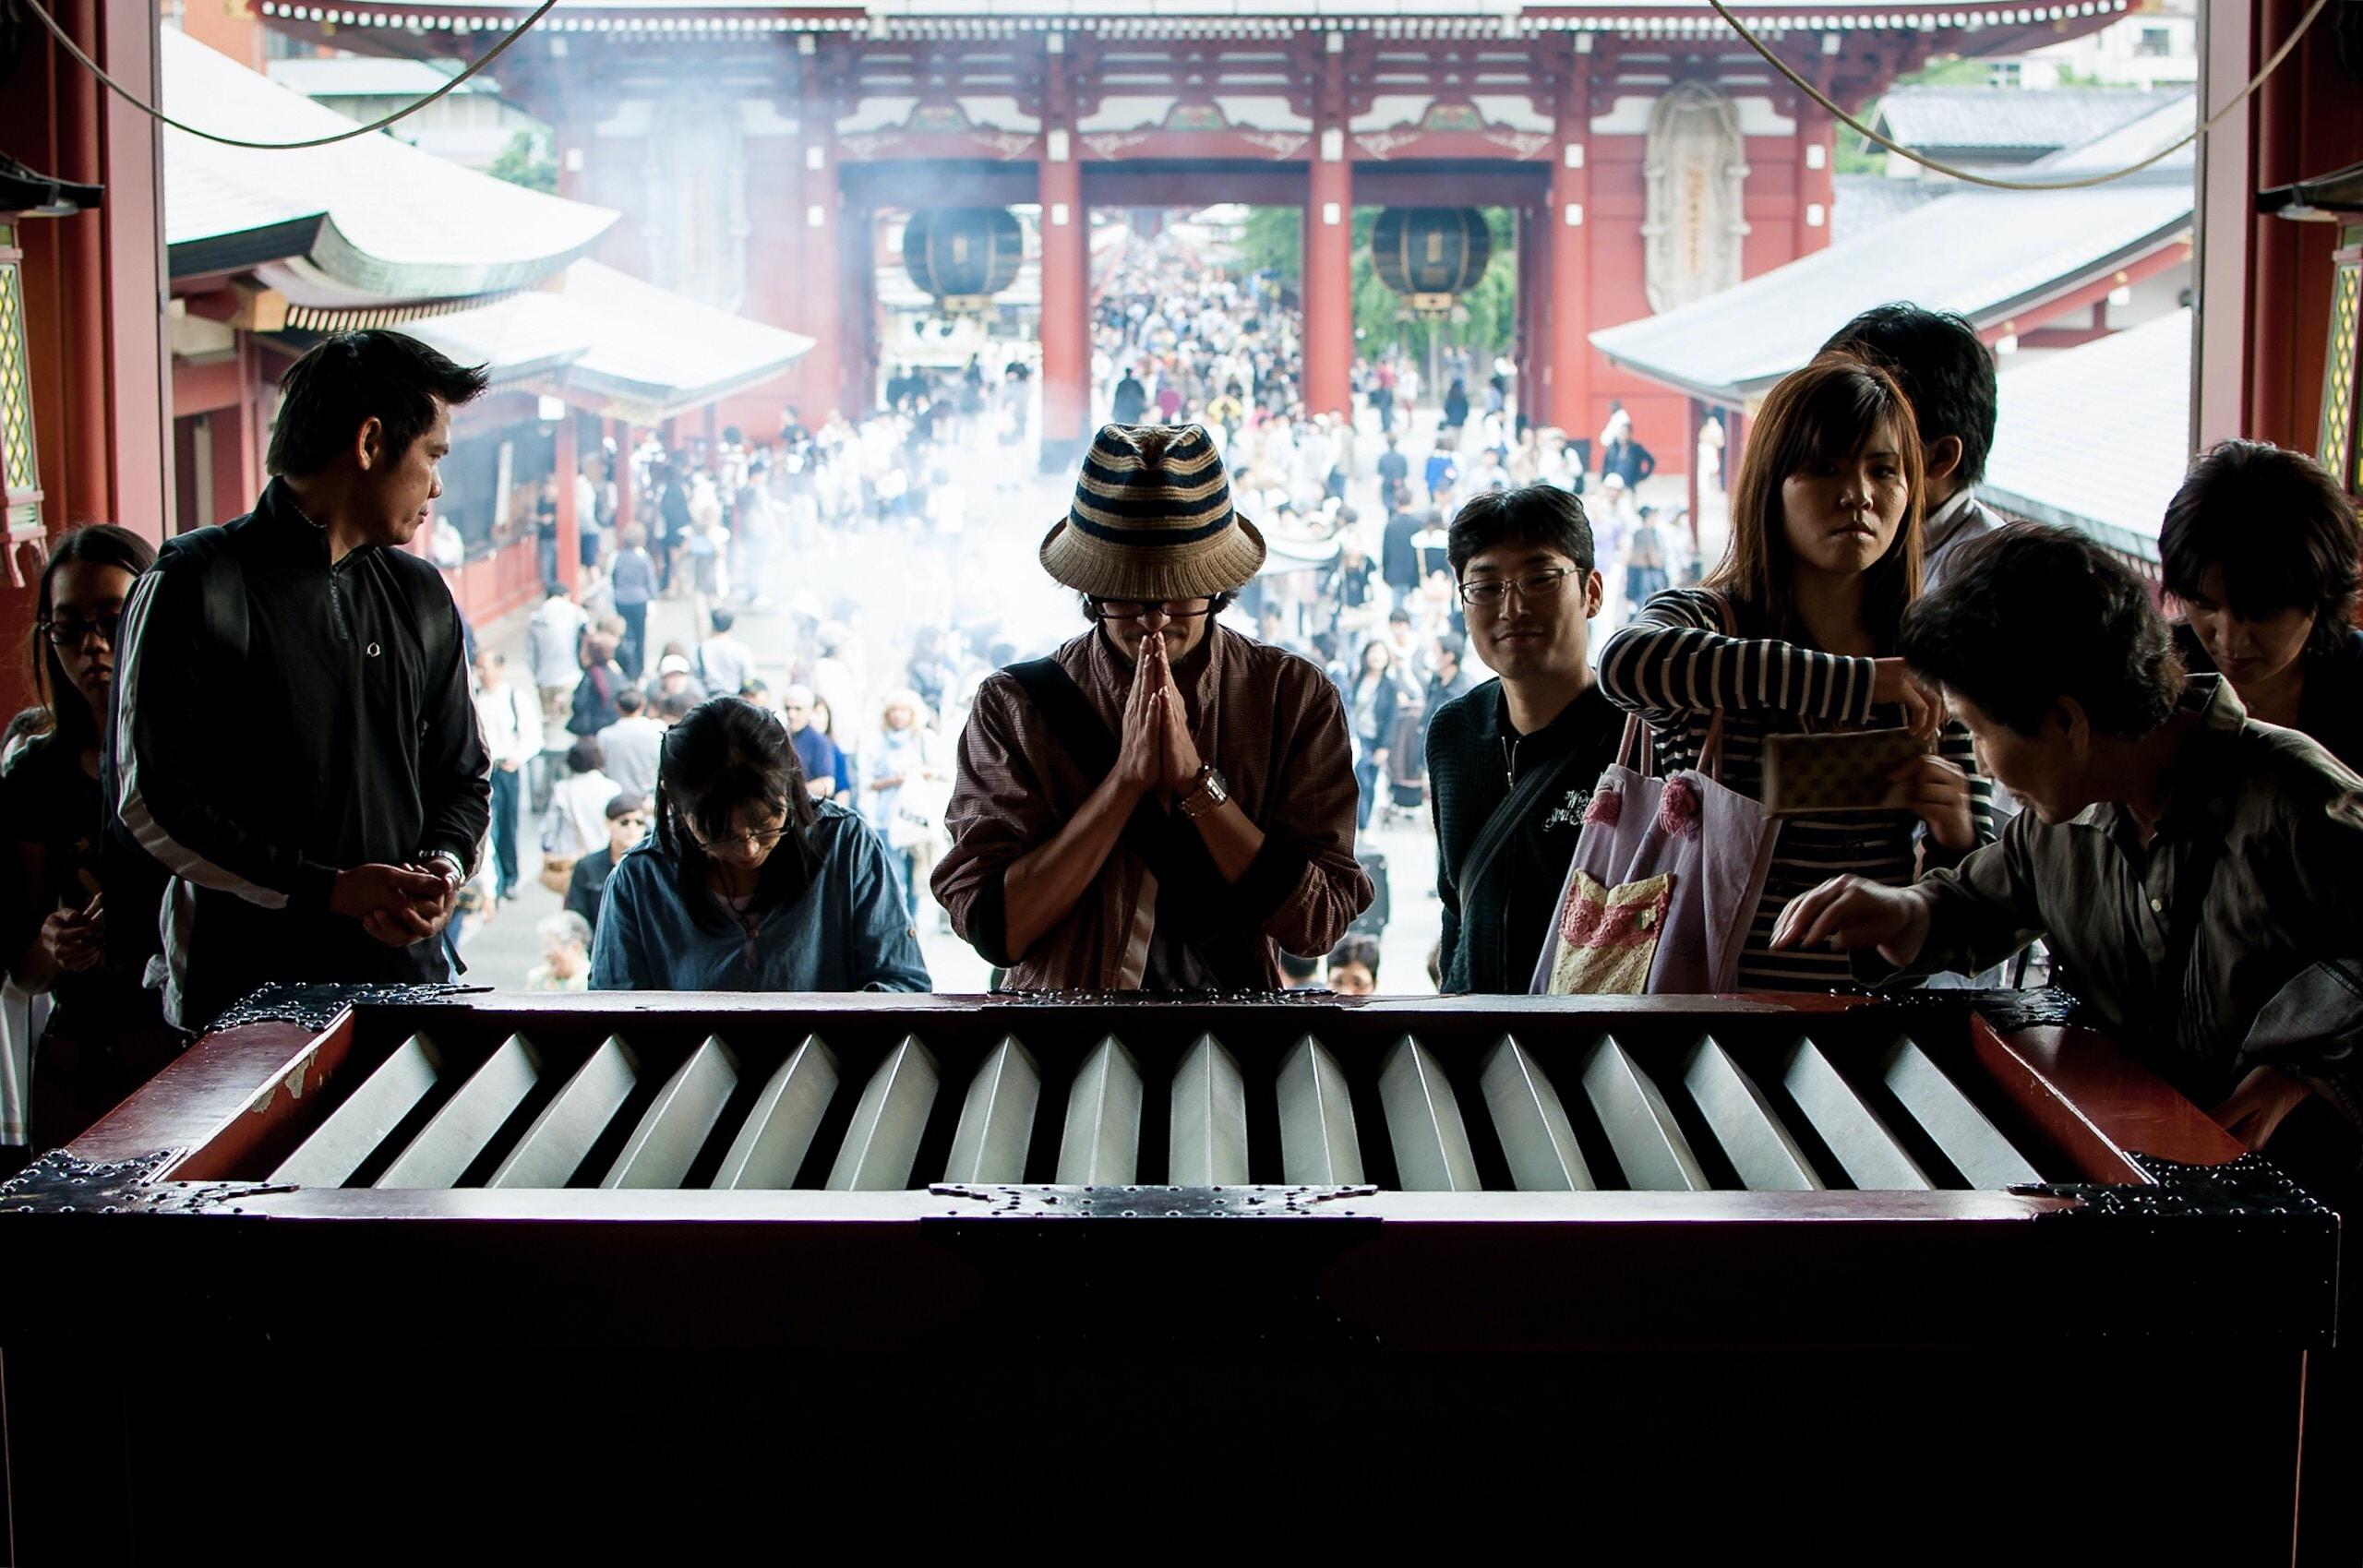 people praying on temple